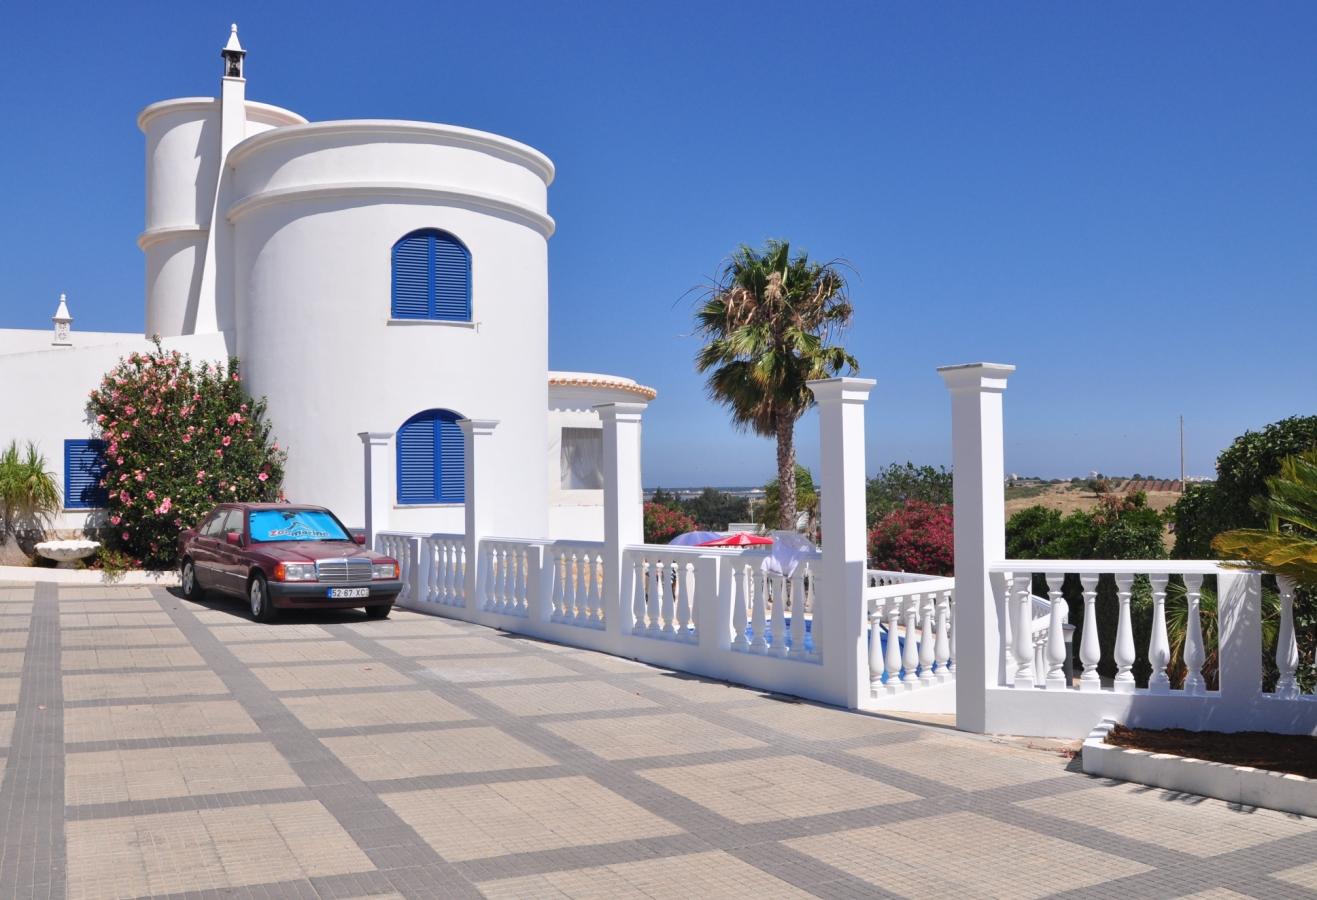 Holiday apartments and villas for rent, Apartment Sétimo Céu (Seventh Heaven) in Castro Marim, Portugal Algarve, REF_IMG_9017_9028